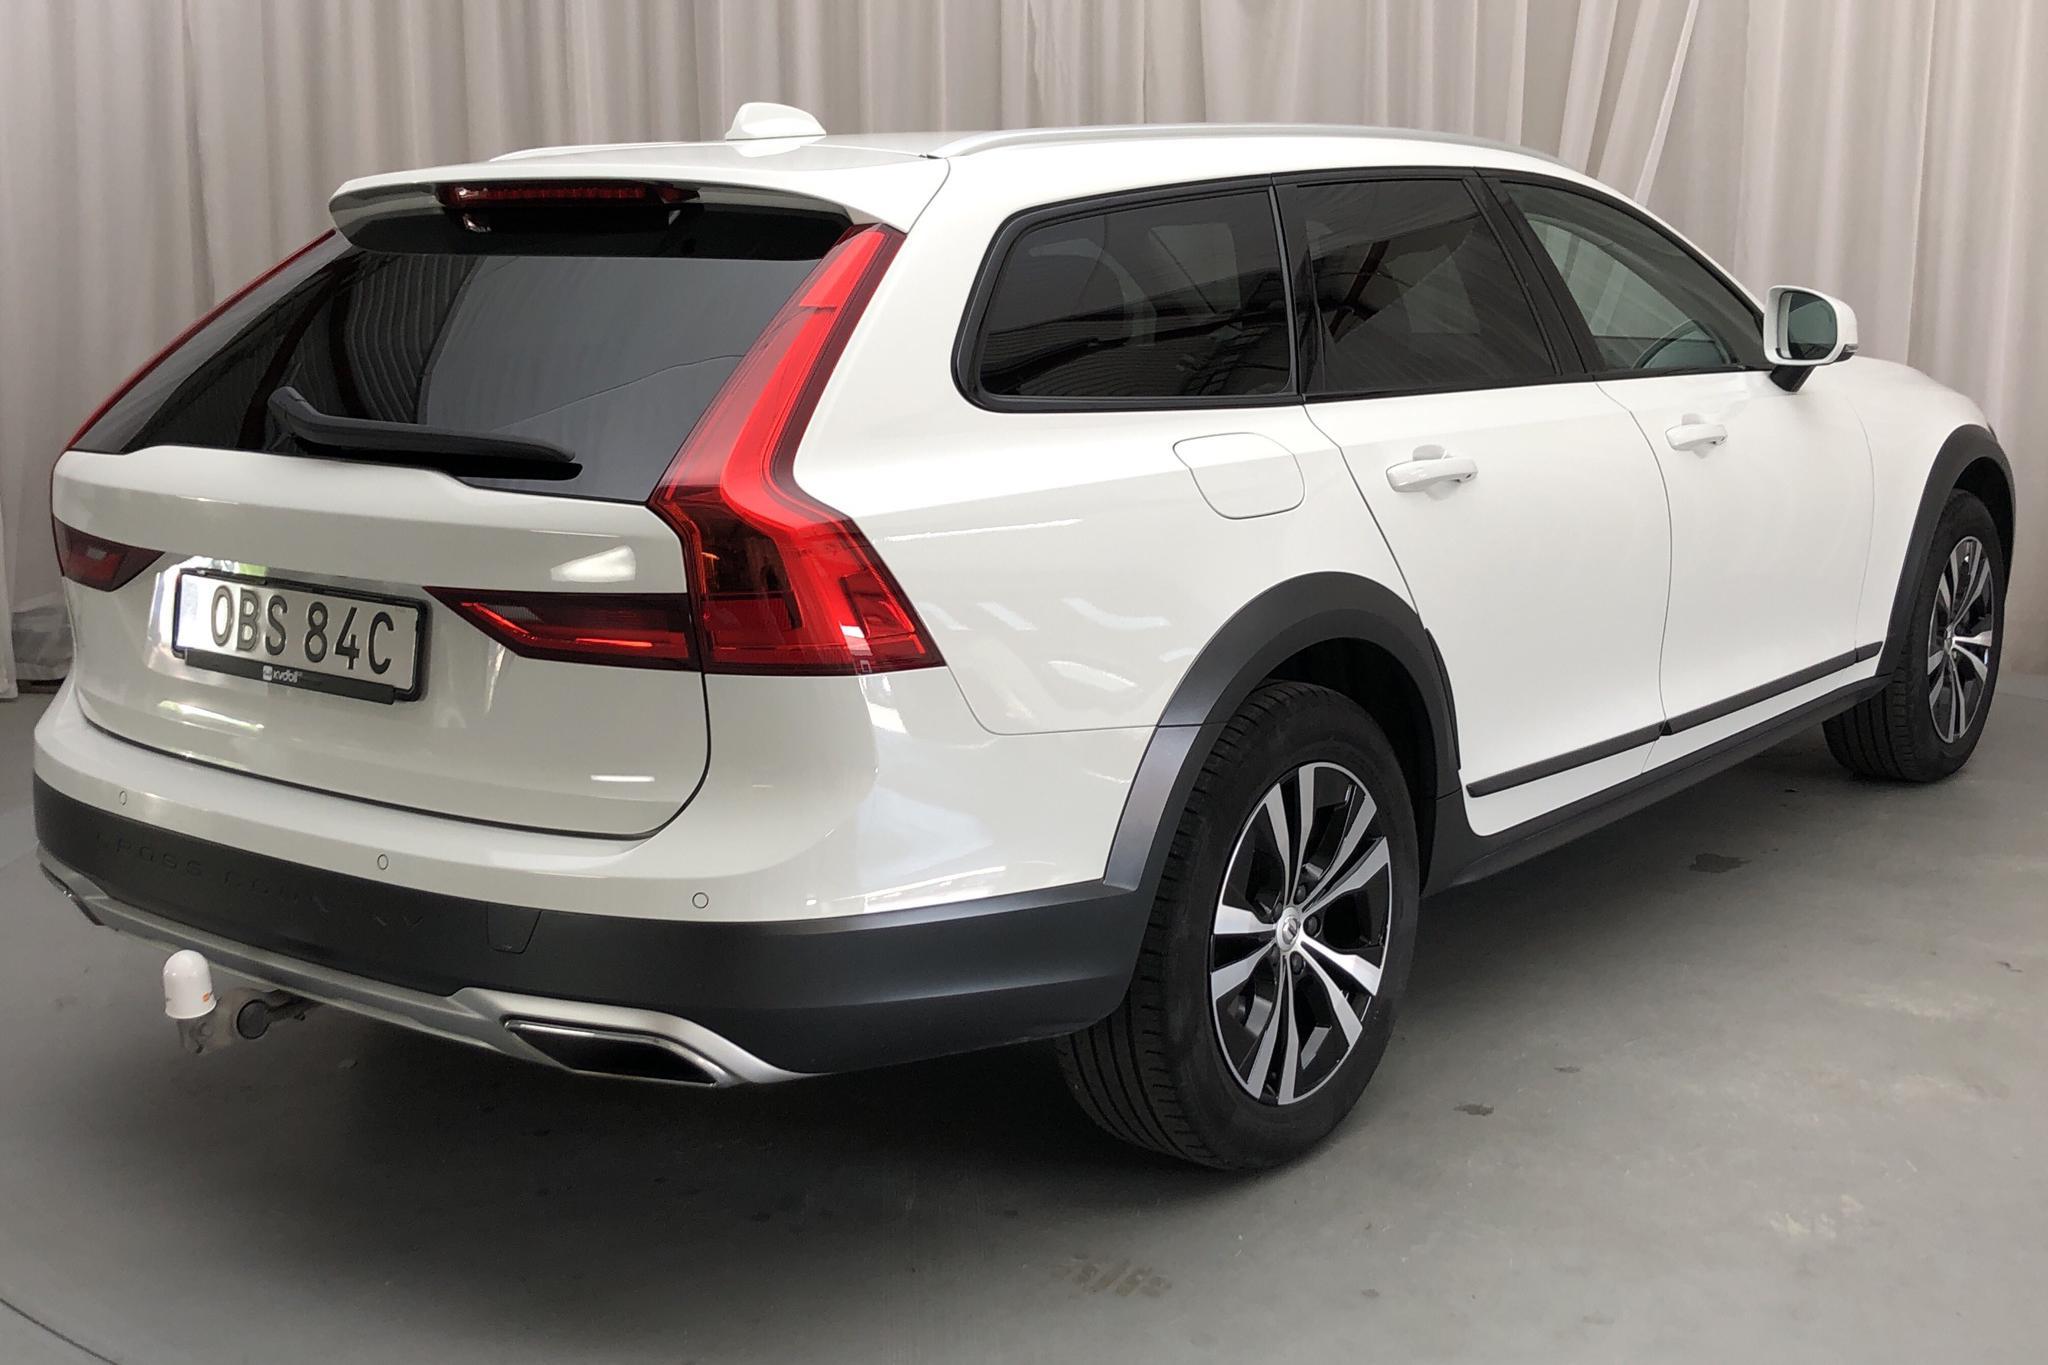 Volvo V90 D4 Cross Country AWD (190hk) - 3 830 mil - Automat - vit - 2020